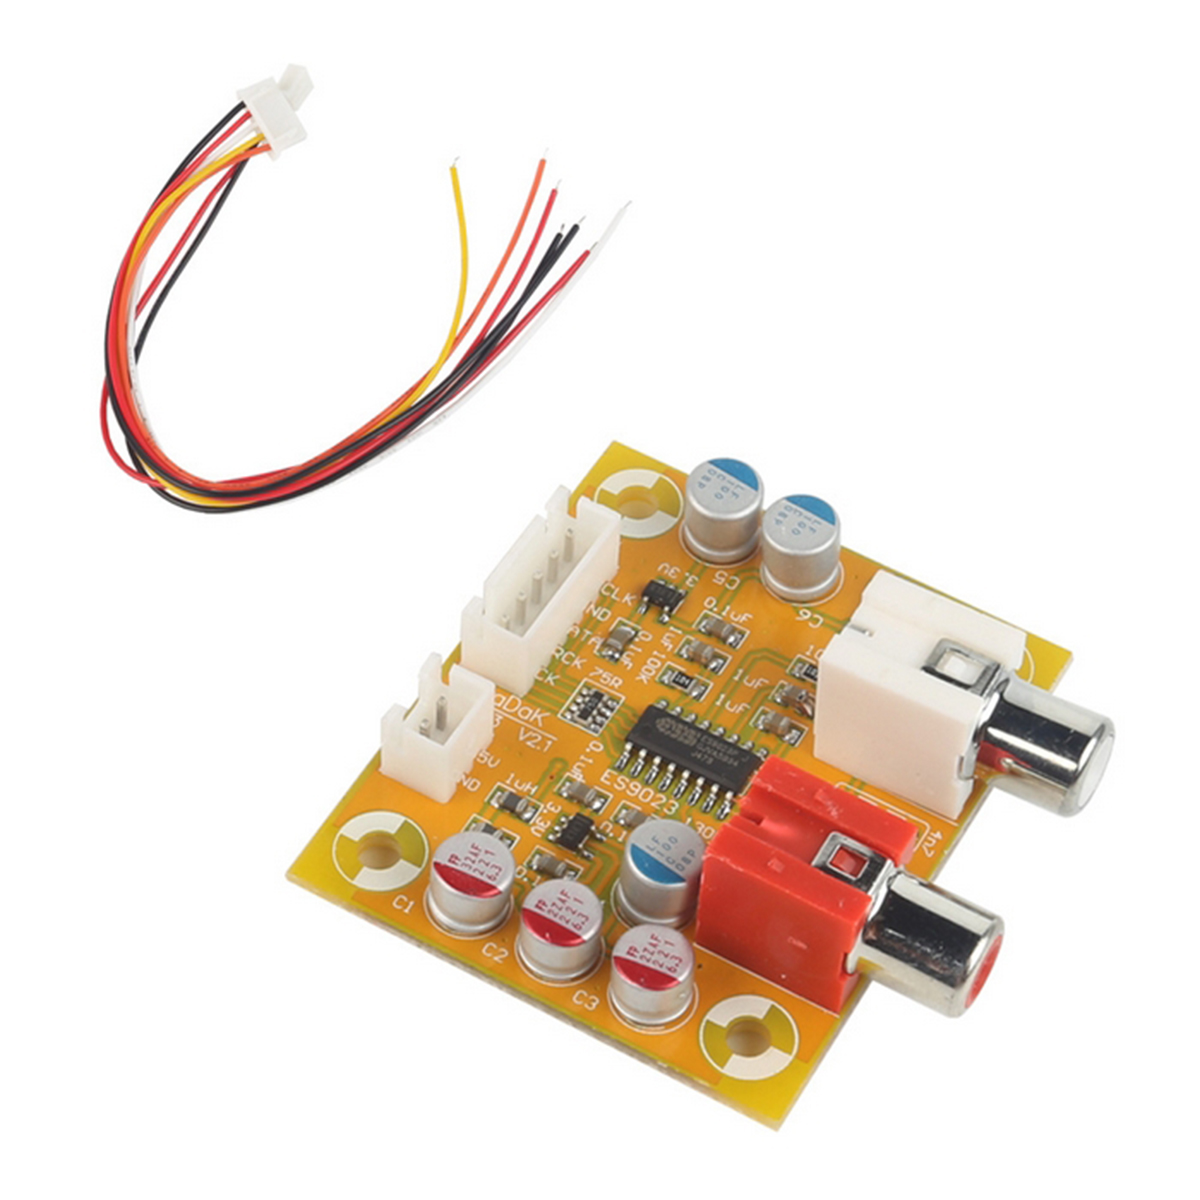 DAC Sabre ES9023 Analogico I2S 24 Bit 192 KHz Modulo scheda di Decodifica Per Raspberry PiDAC Sabre ES9023 Analogico I2S 24 Bit 192 KHz Modulo scheda di Decodifica Per Raspberry Pi